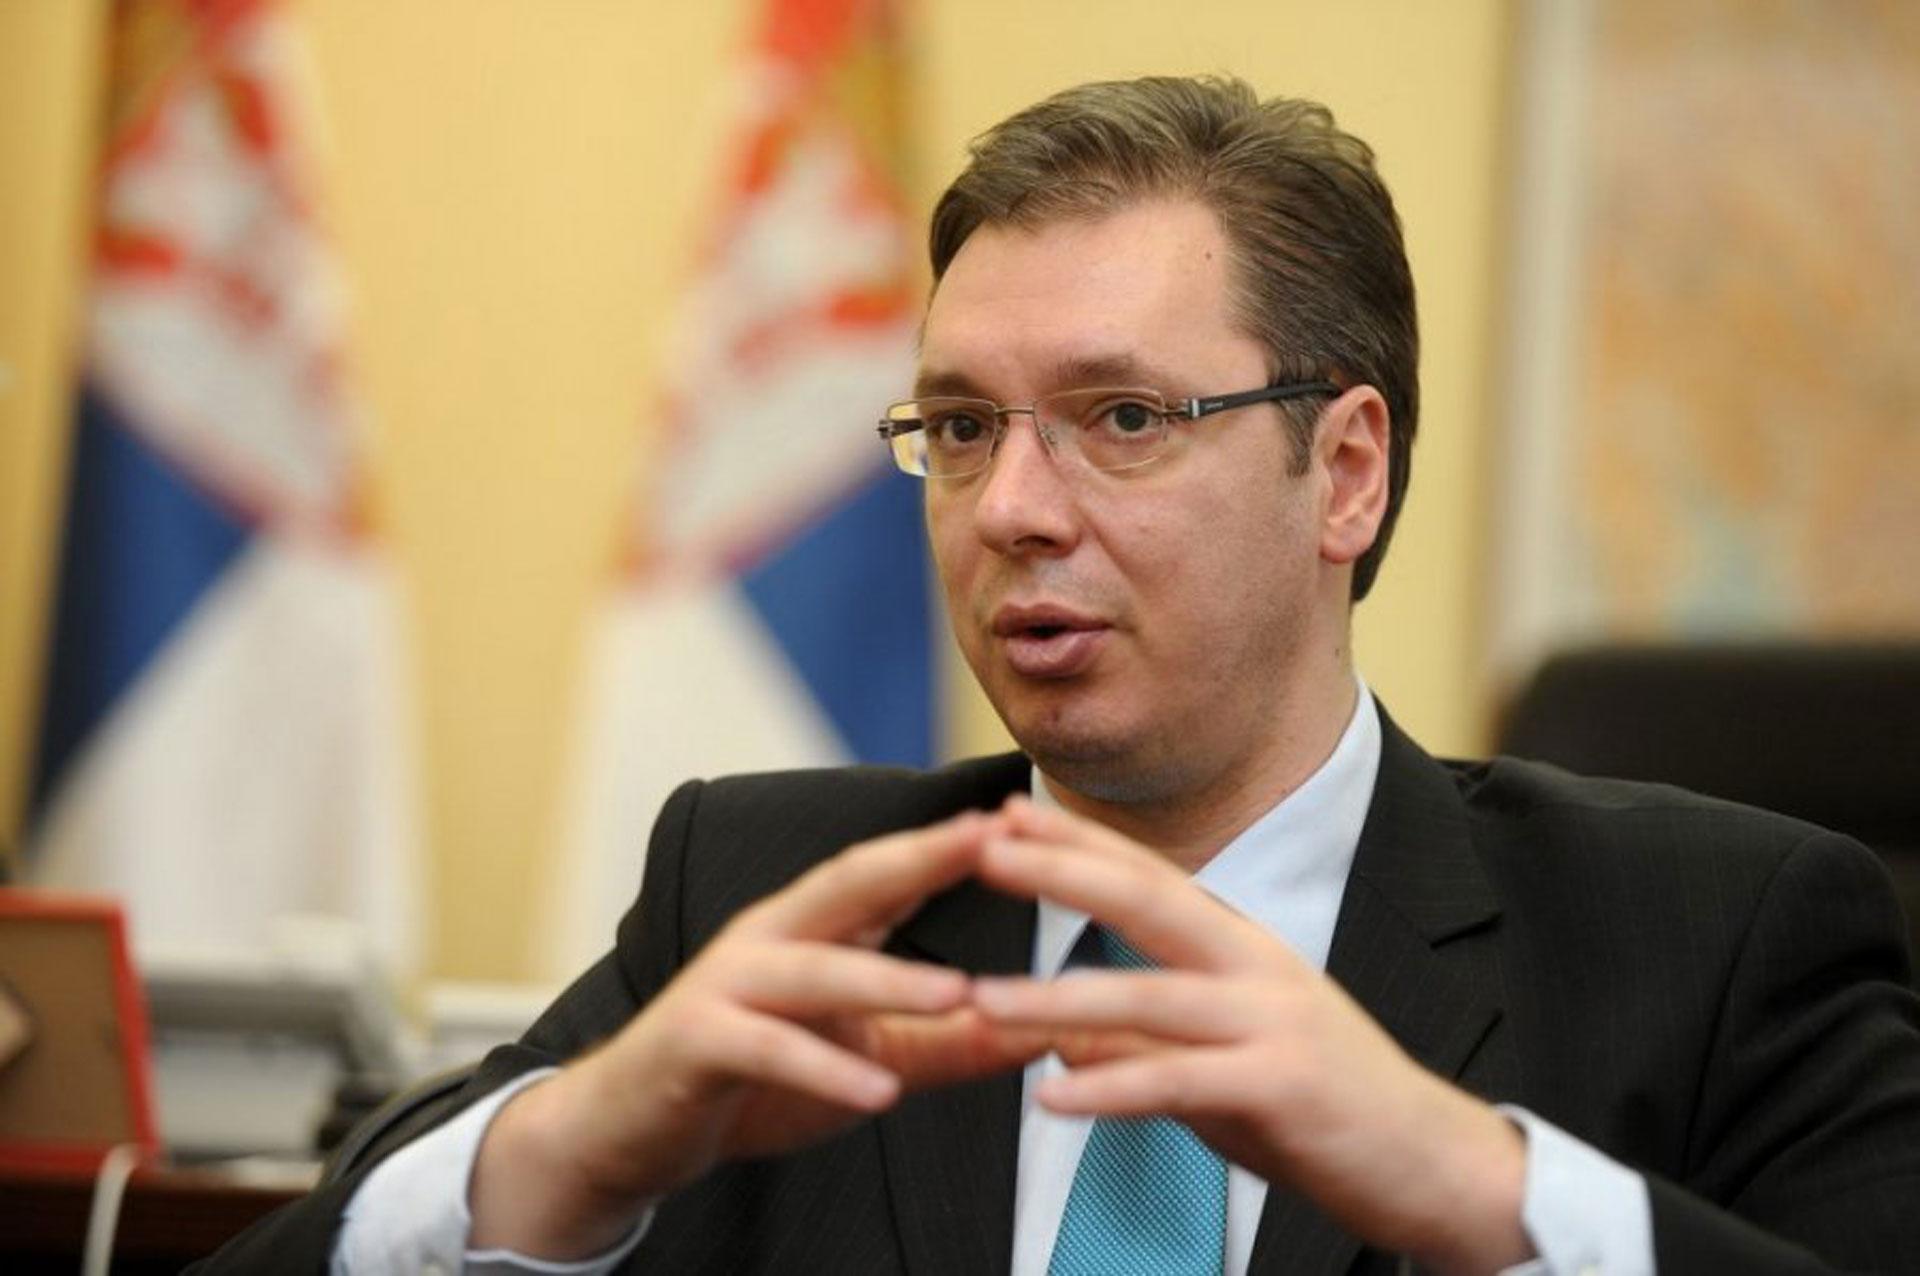 Vucic 'afraid' because of Bosnia